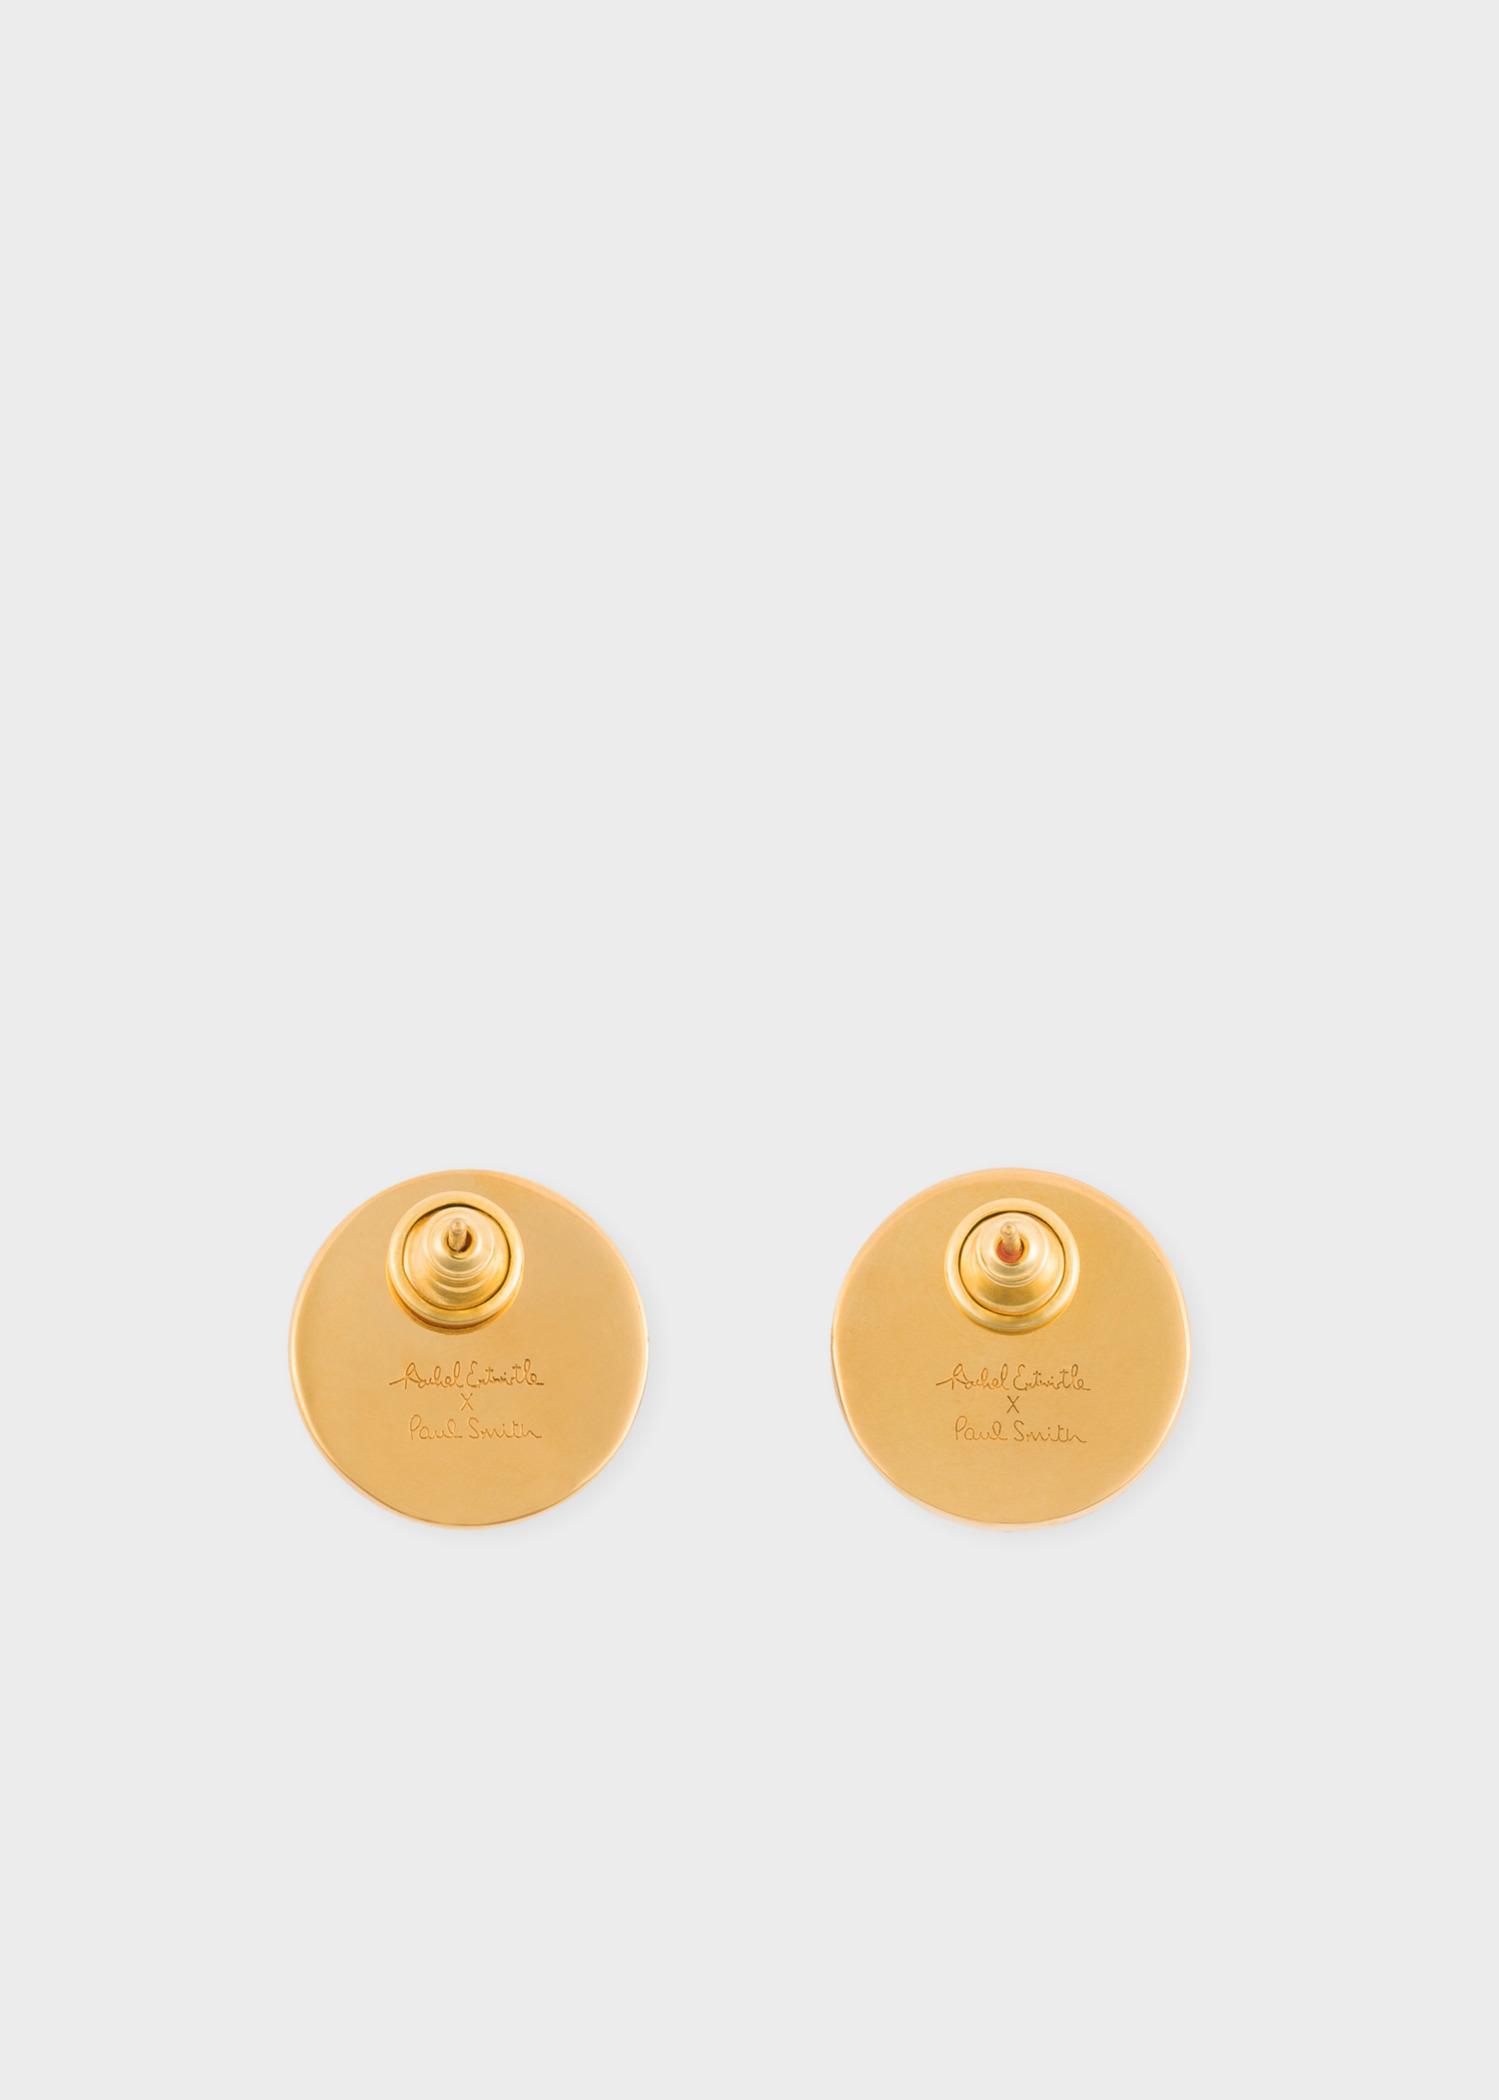 Paul Smith X Rachel Entwistle Gold Stud Earrings With Red C Stone